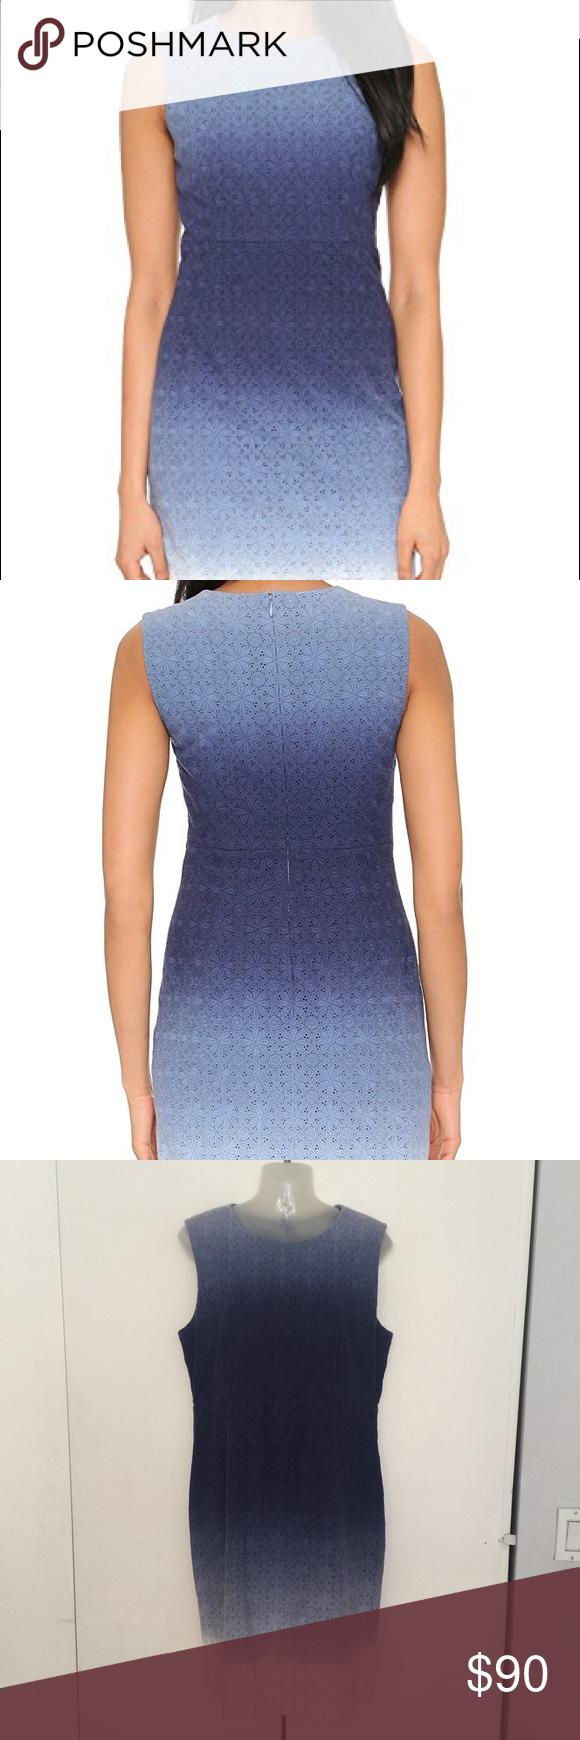 Dvf Kedina Cotton Eyelet Shift Dress Shift Dress Dresses Eyelet Dress [ 1740 x 580 Pixel ]